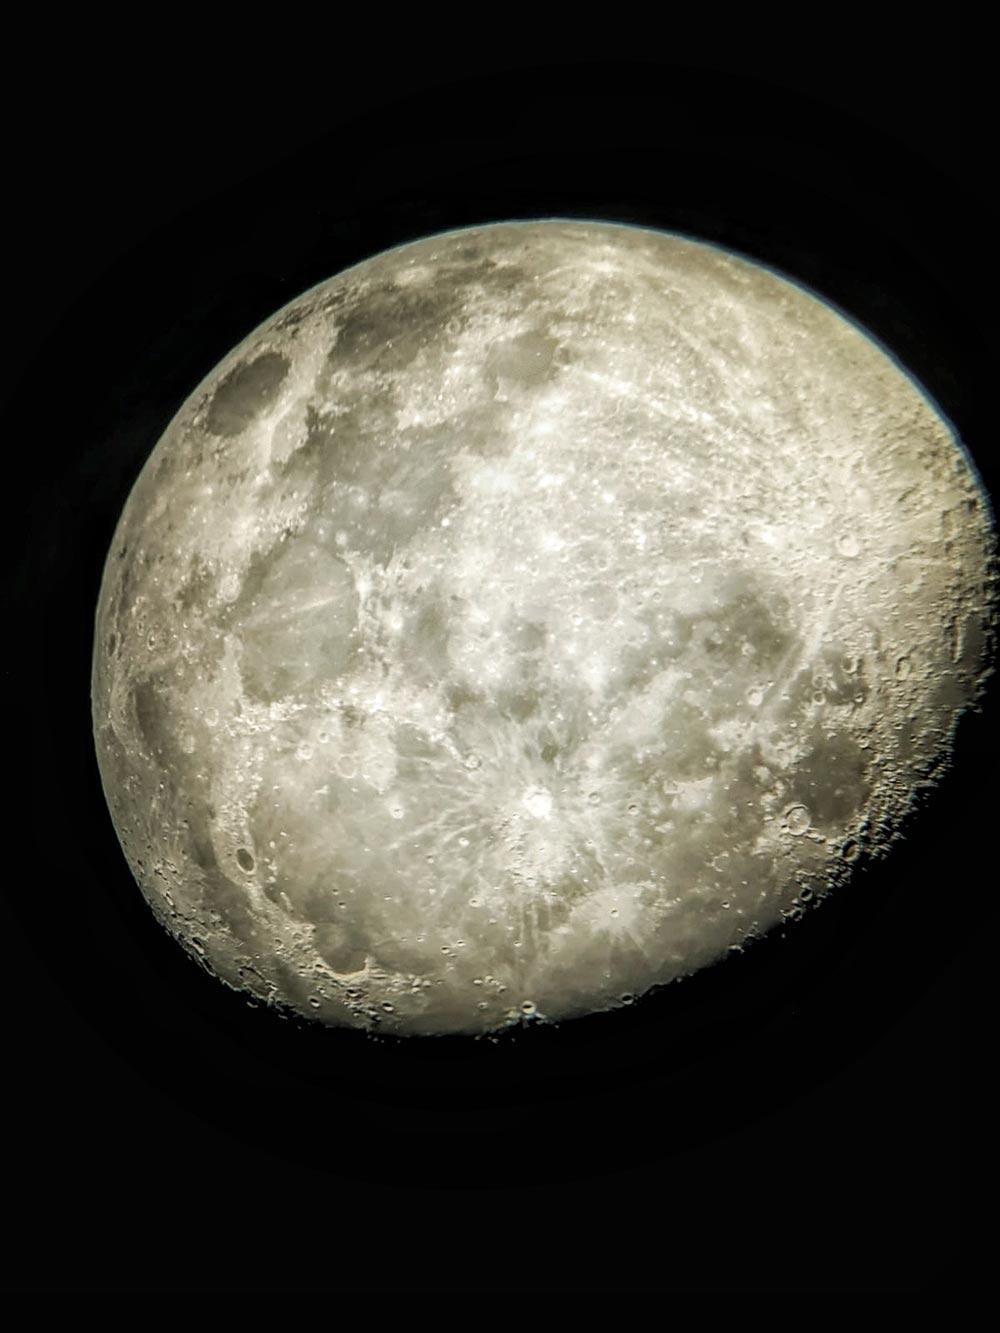 moon photo in england